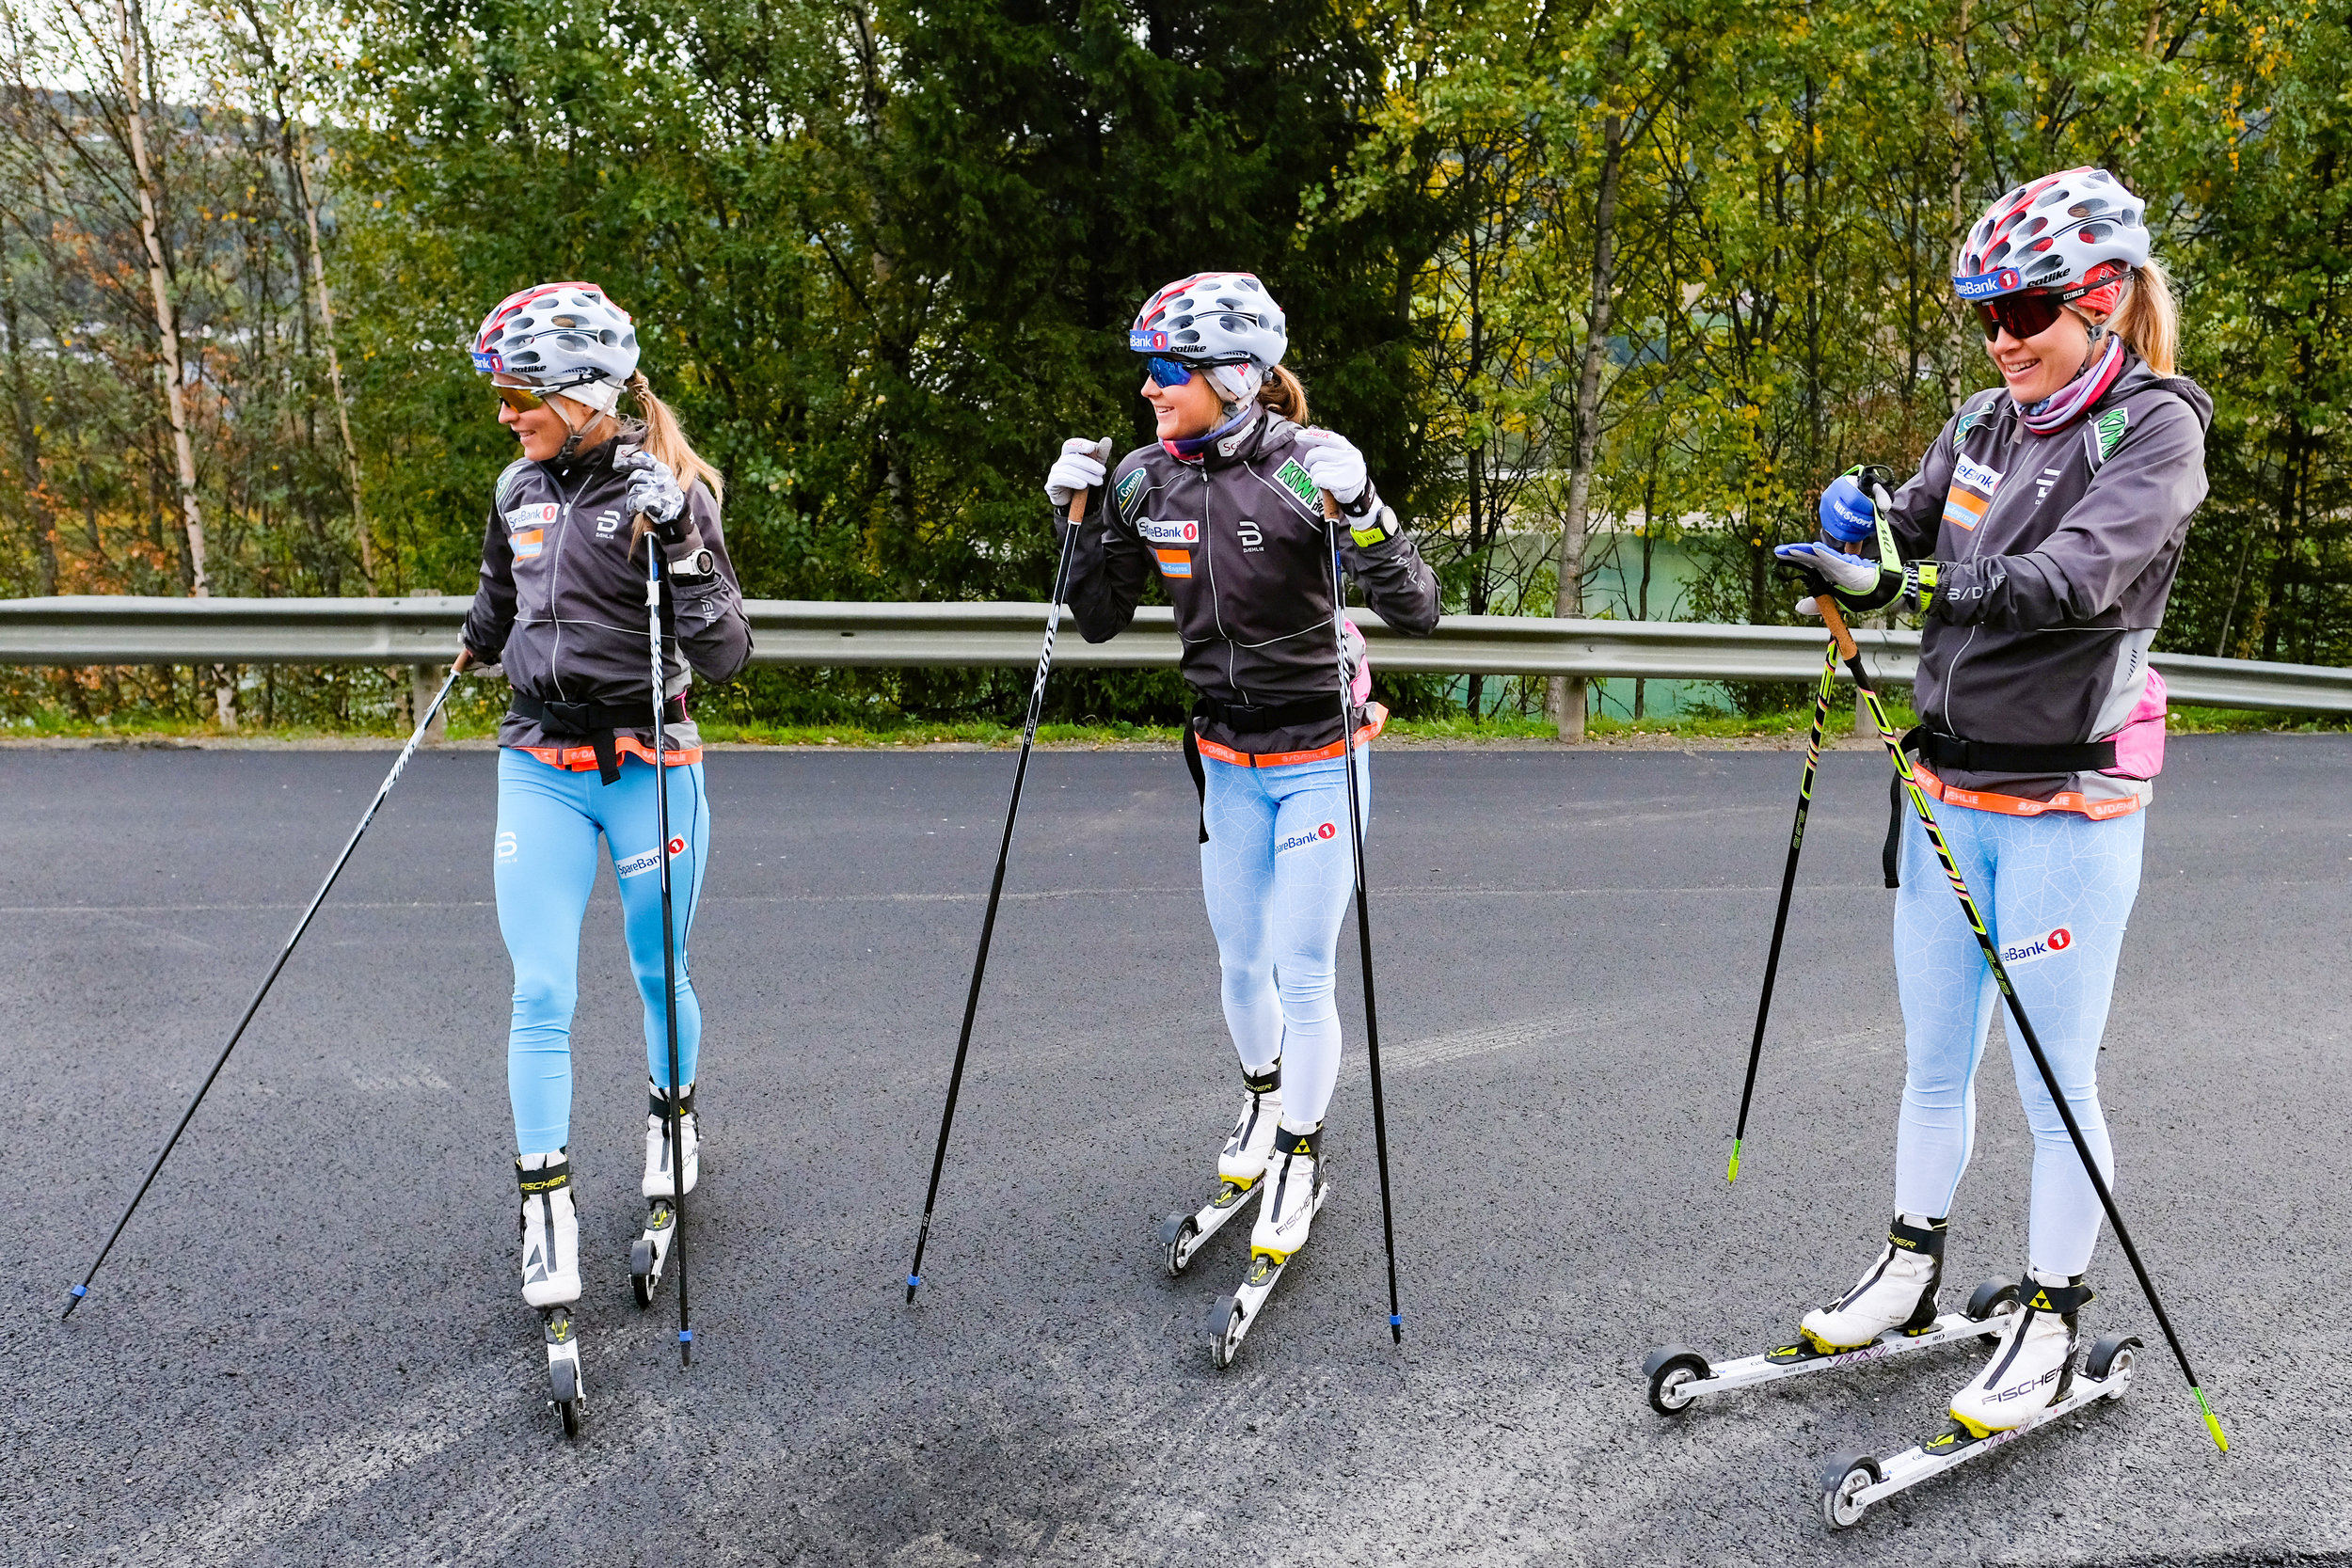 Therese Johaug (f.v.), Ingvild Flugstad Østberg og Ragnhild Haga. Foto: Fredrik Hagen / NTB Scanpix